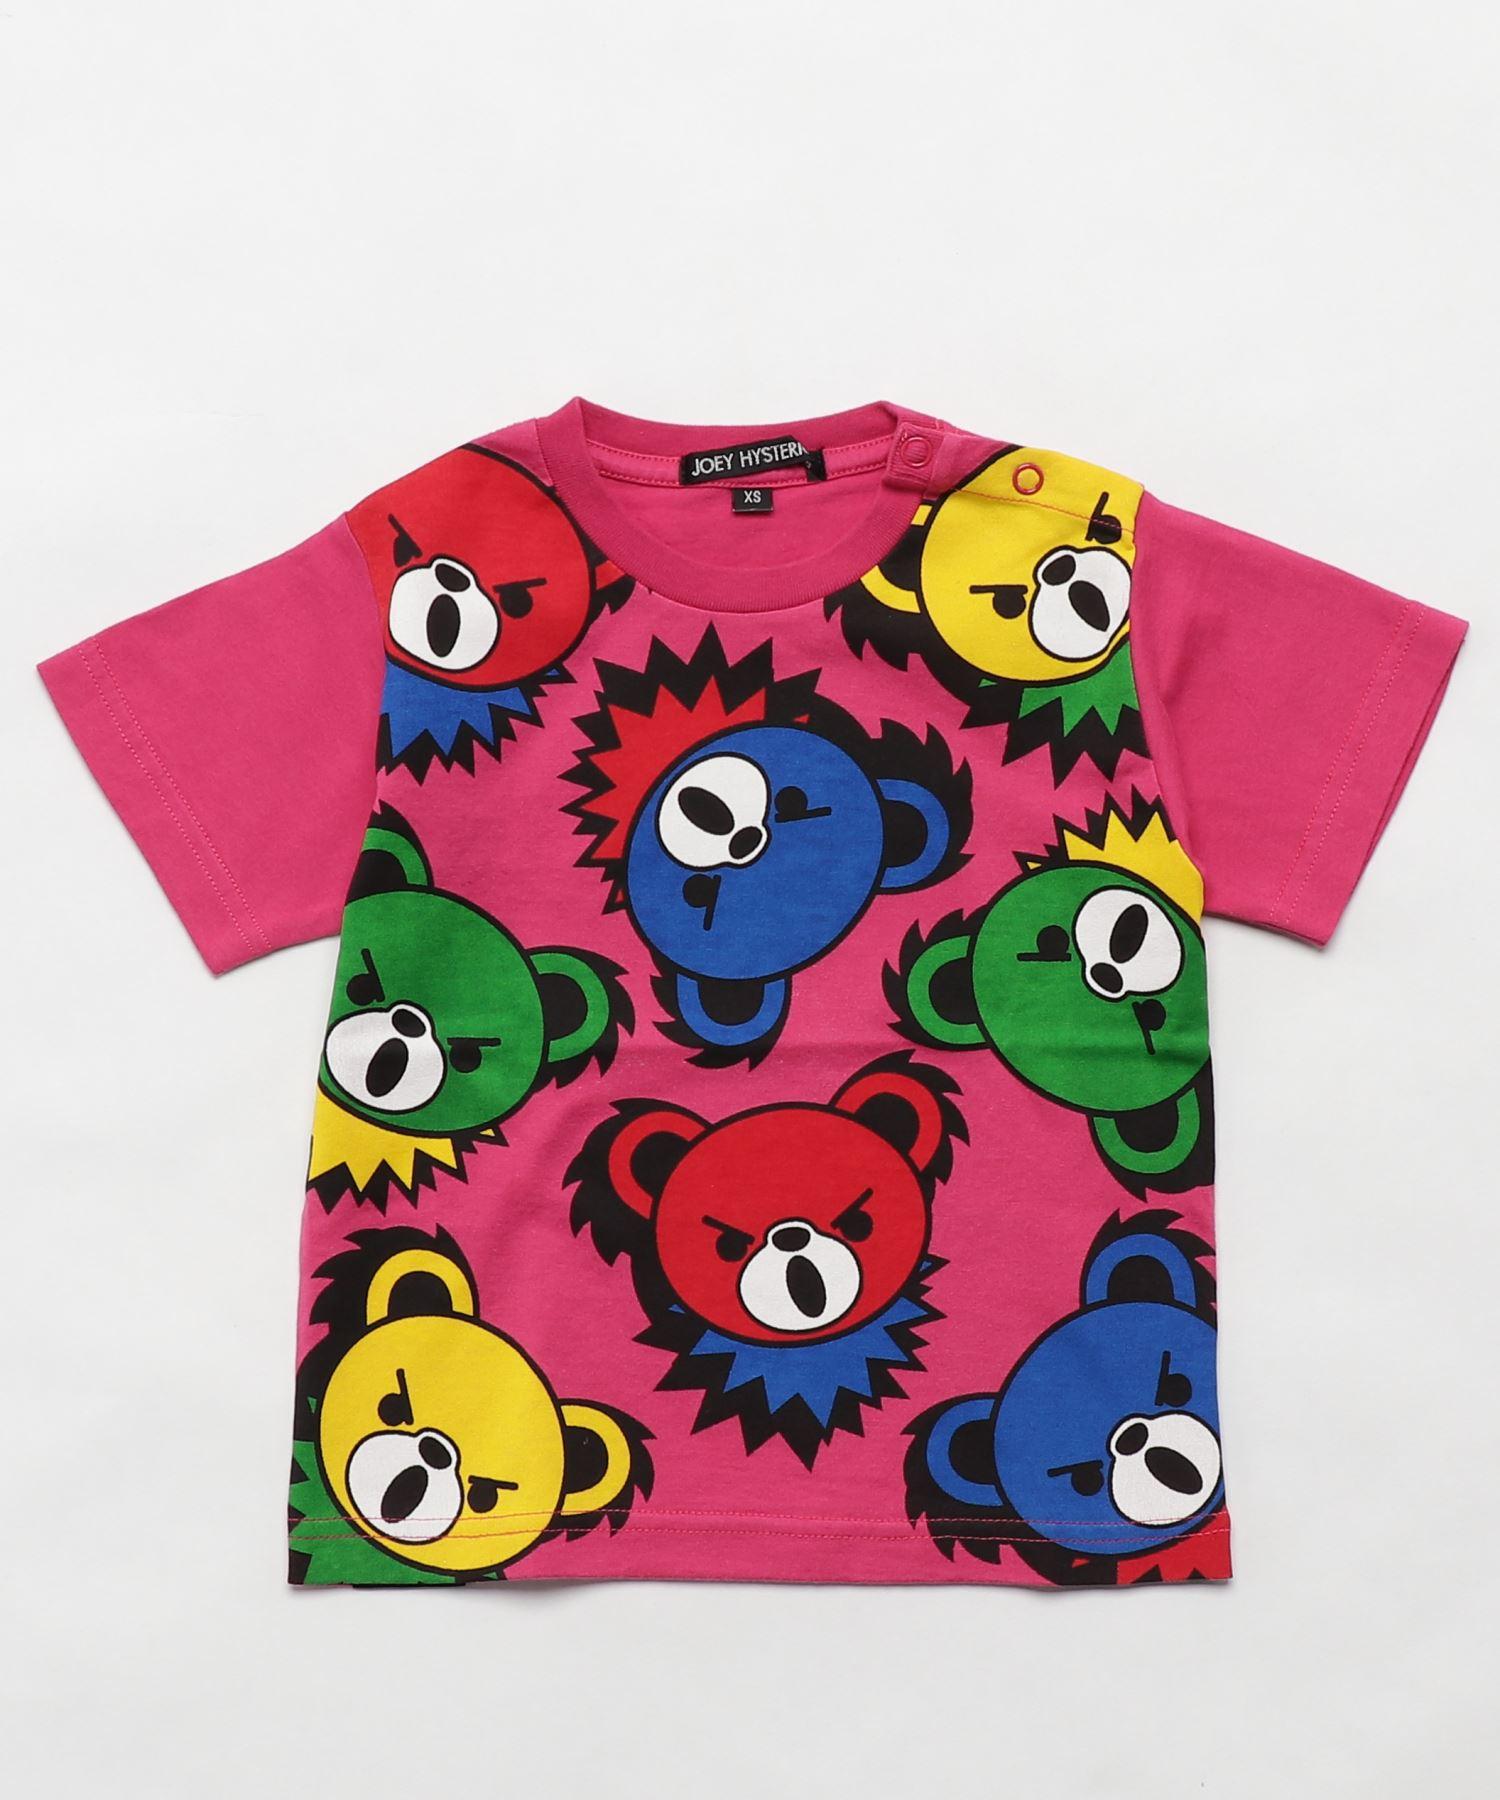 HYS BEAR PANEL pt Tシャツ【XS/S/M】